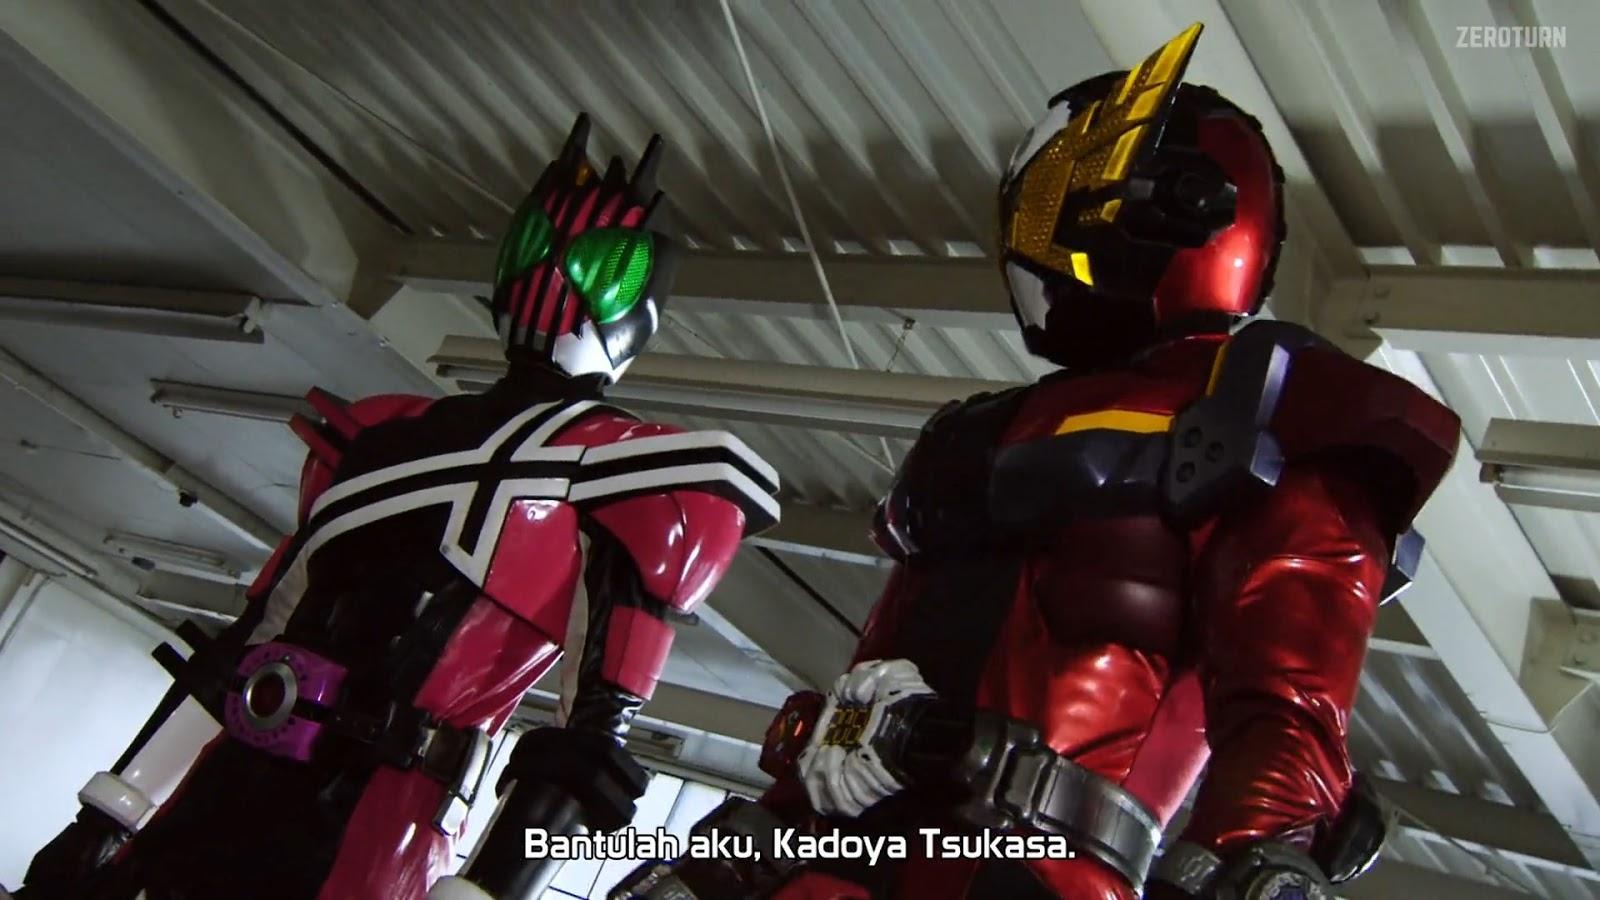 Kamen Rider Zi O Episode Kamen Rider Decade Zi O 1600x900 Wallpaper Teahub Io